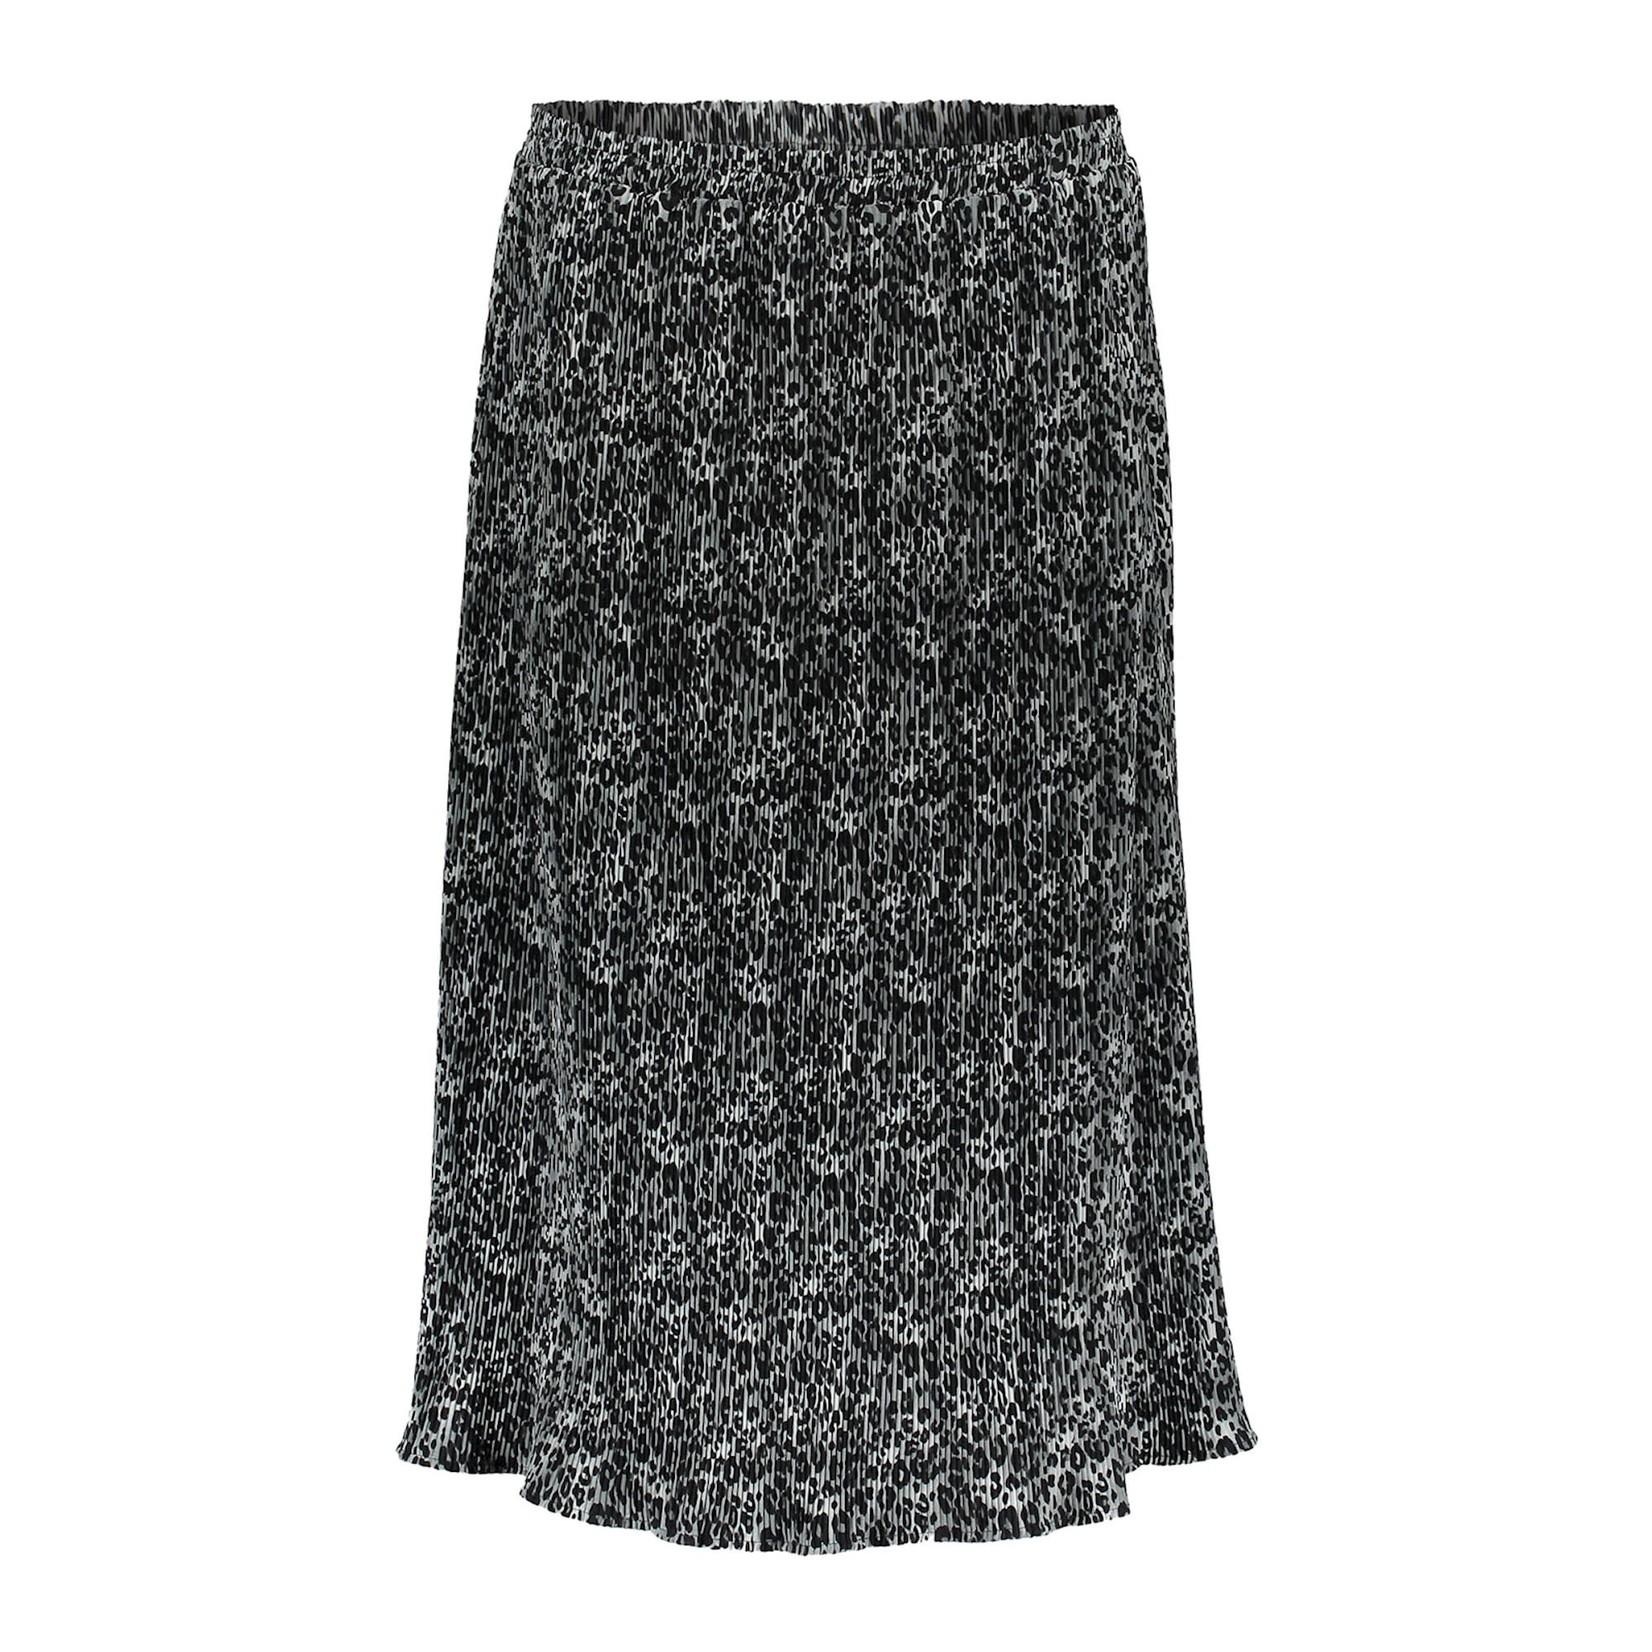 Geisha Geisha Skirt Grey/black 16597-20